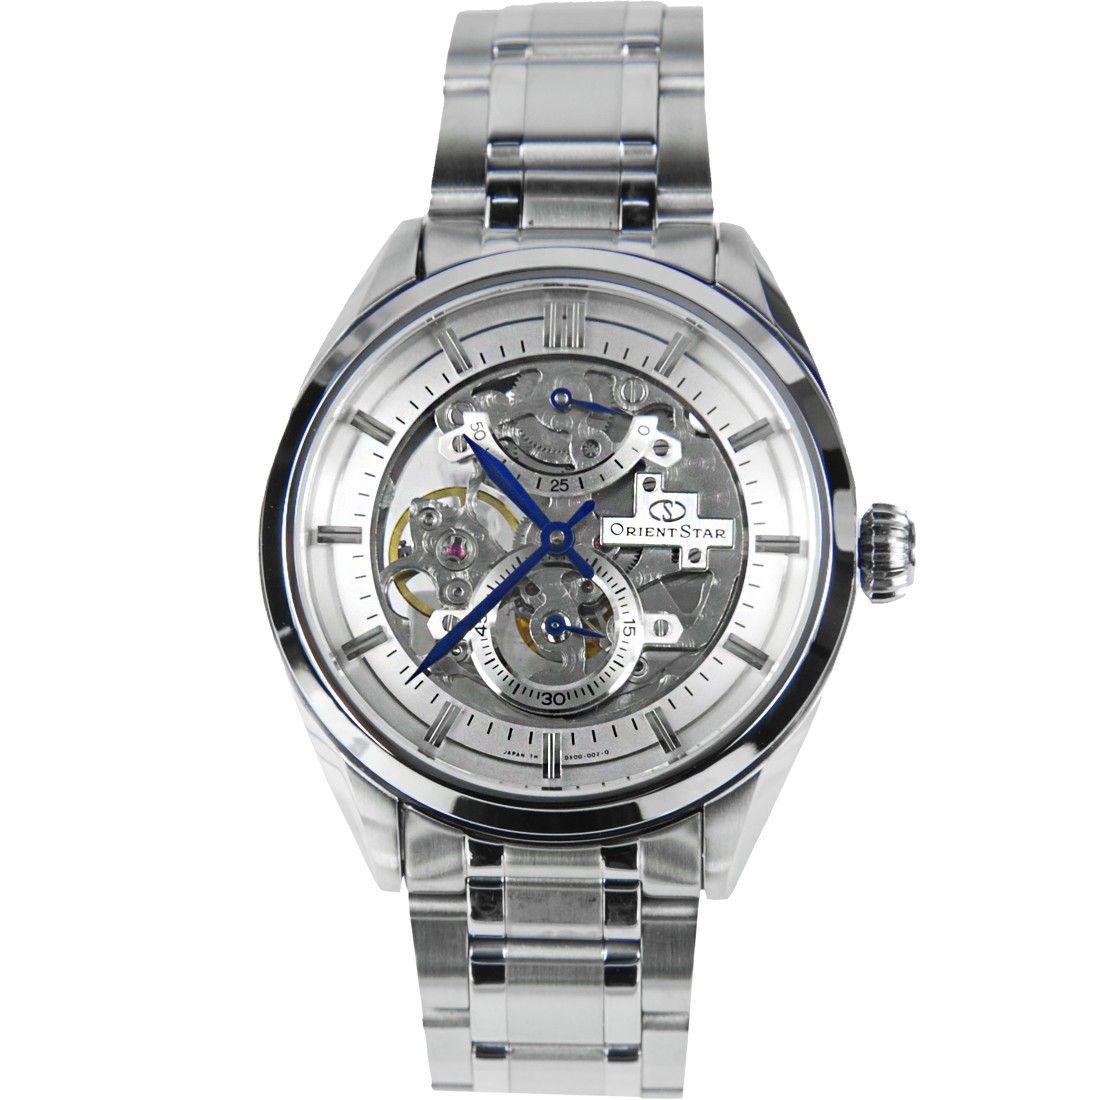 9538c3cb886 Orient Star Full Skeleton Automatic Mens Watch DX00001W